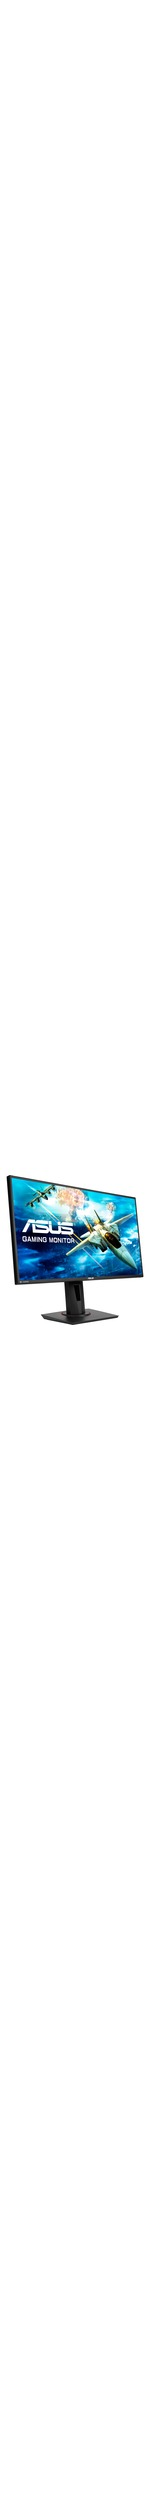 Asus VG278Q 27And#34; LED LCD Monitor - 16:9 - 1 ms